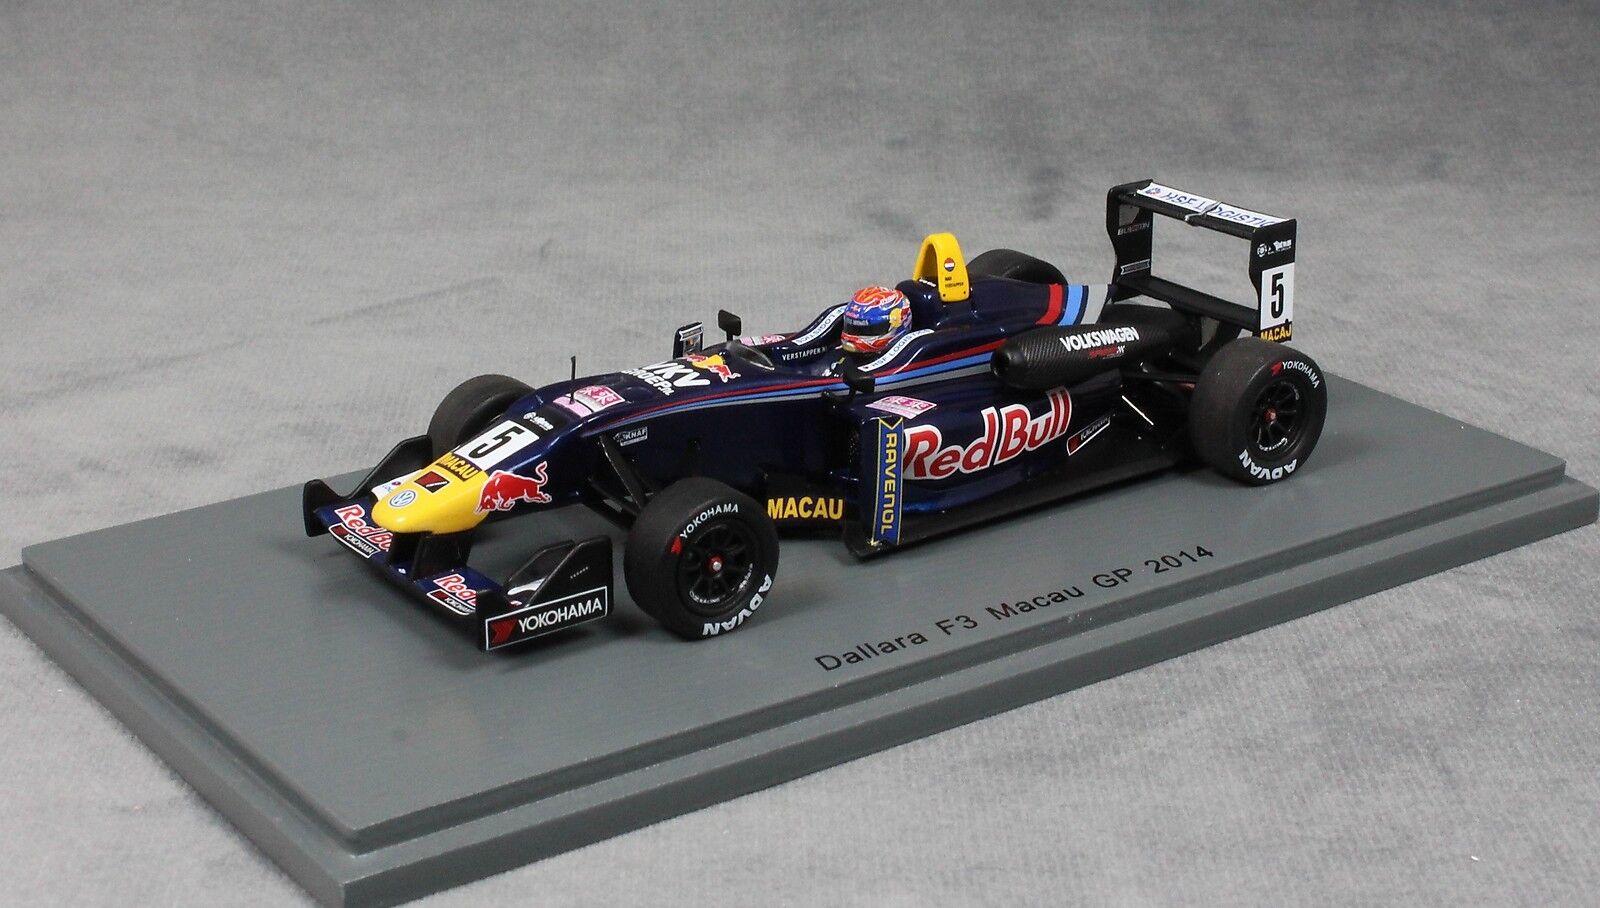 SPARK Dallara Volkswagen Macau GP Course F3 2014 Max Verstappen SA105 1 43 NEUF